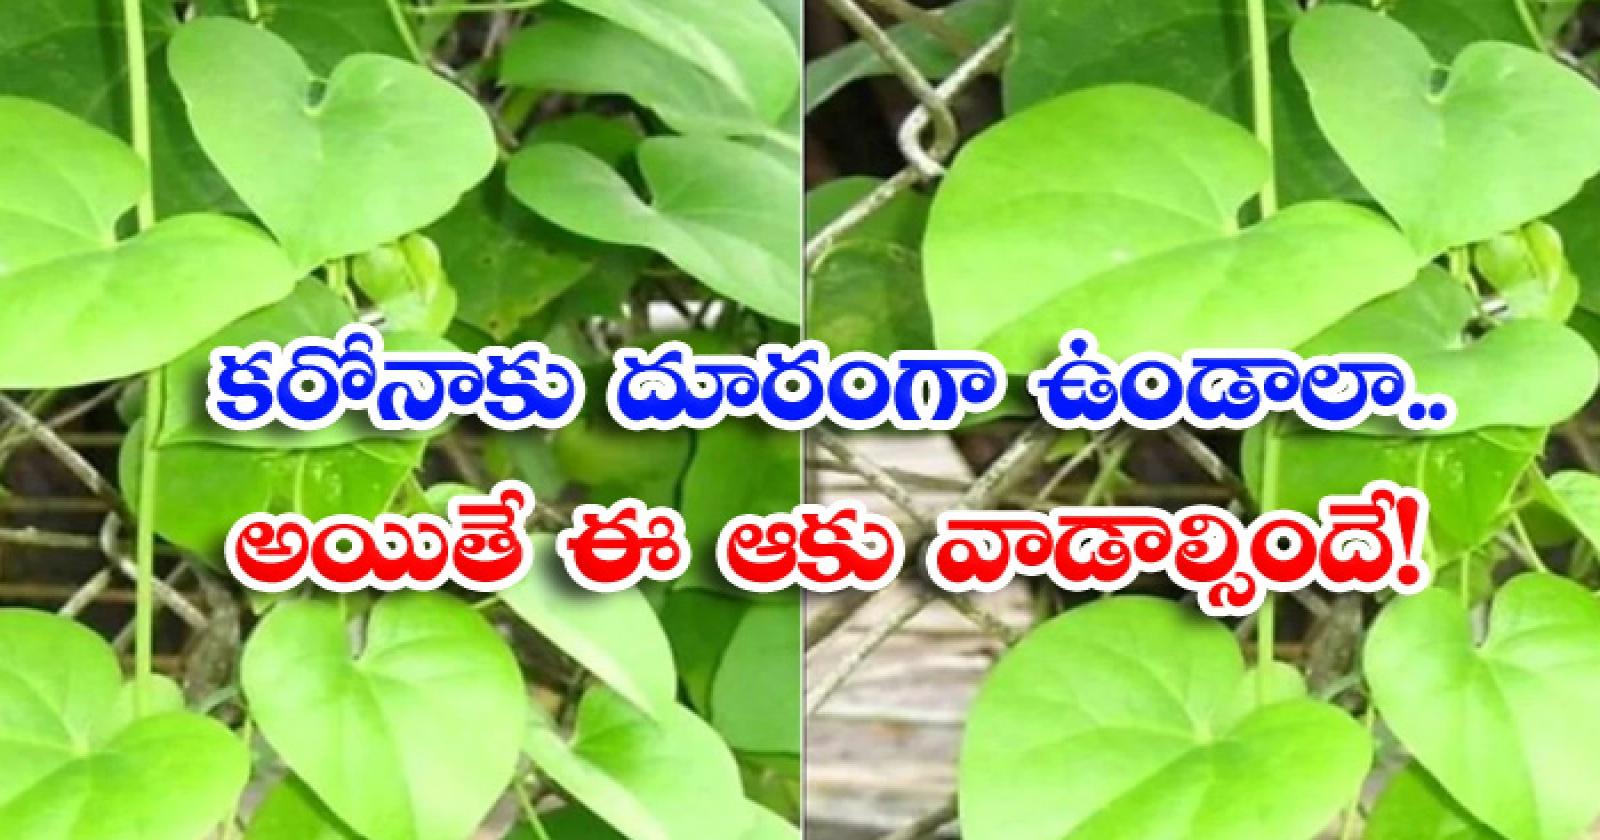 Health Benefits Of Tippa Teega Corona Time Tippa Teega-కరోనాకు దూరంగా ఉండాలా..అయితే ఈ ఆకు వాడాల్సిందే-Latest News - Telugu-Telugu Tollywood Photo Image-TeluguStop.com